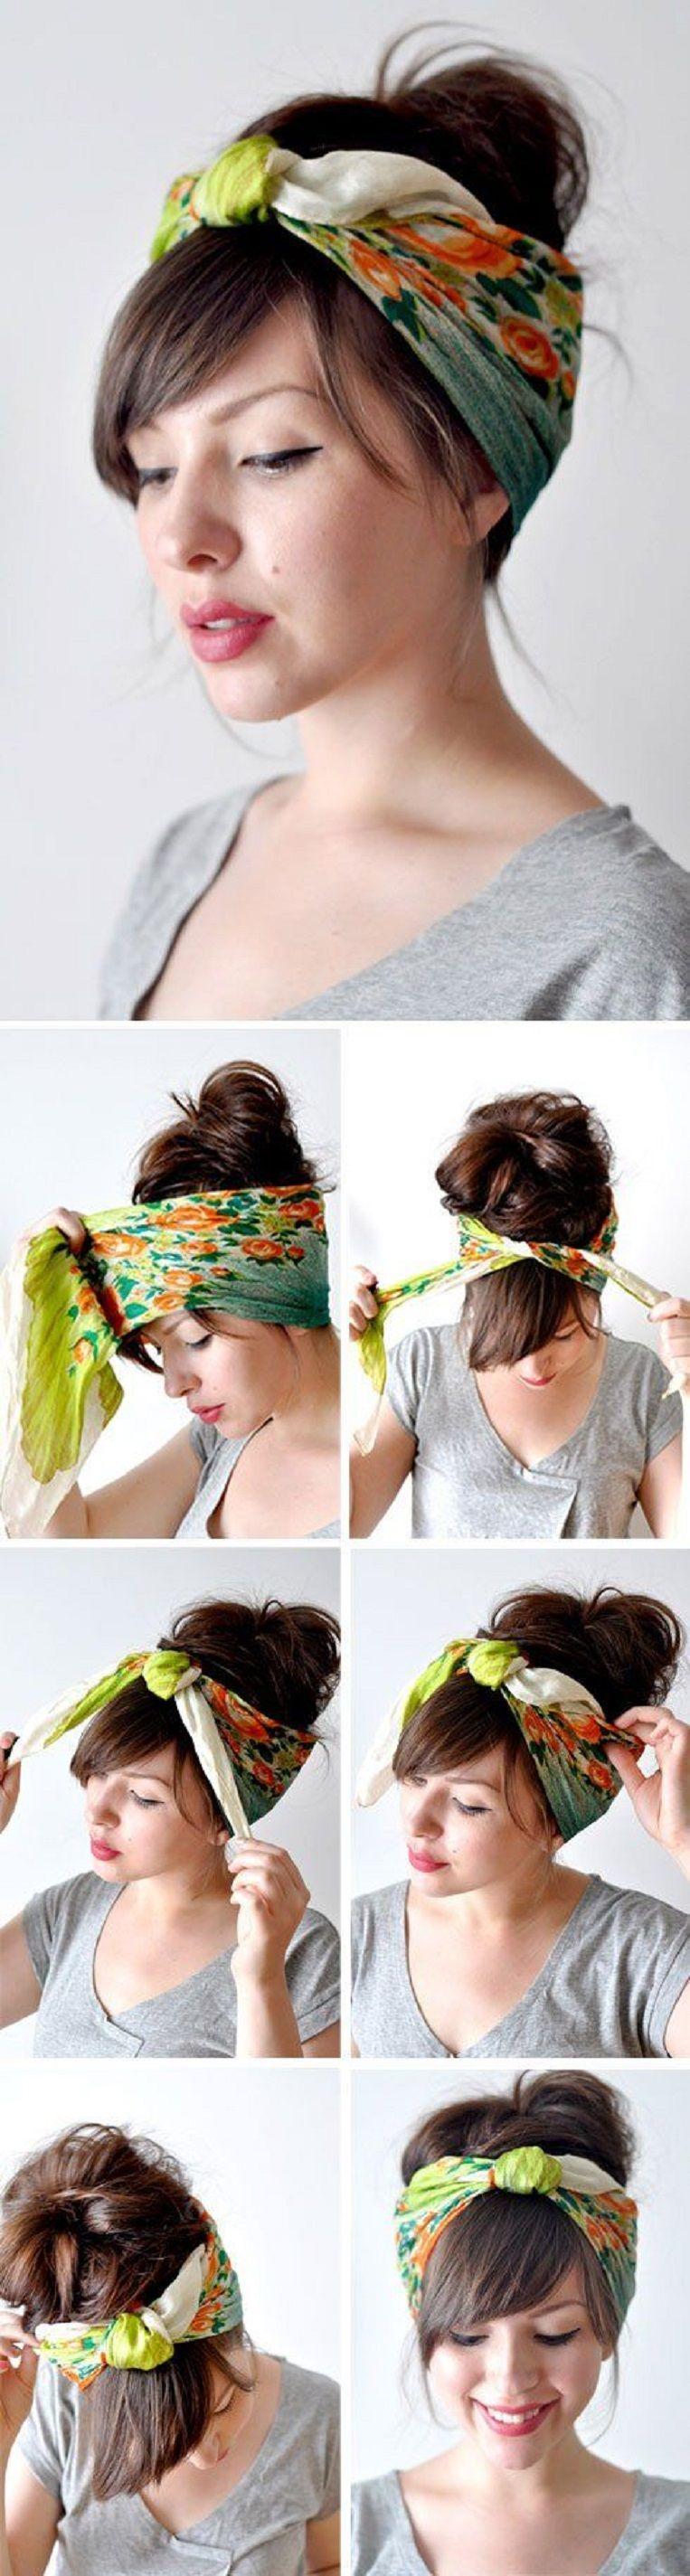 15 Cool Headwrap Scarf Tutorials For Summer Head Scarf Tutorial Scarf Hairstyles Bandana Hairstyles